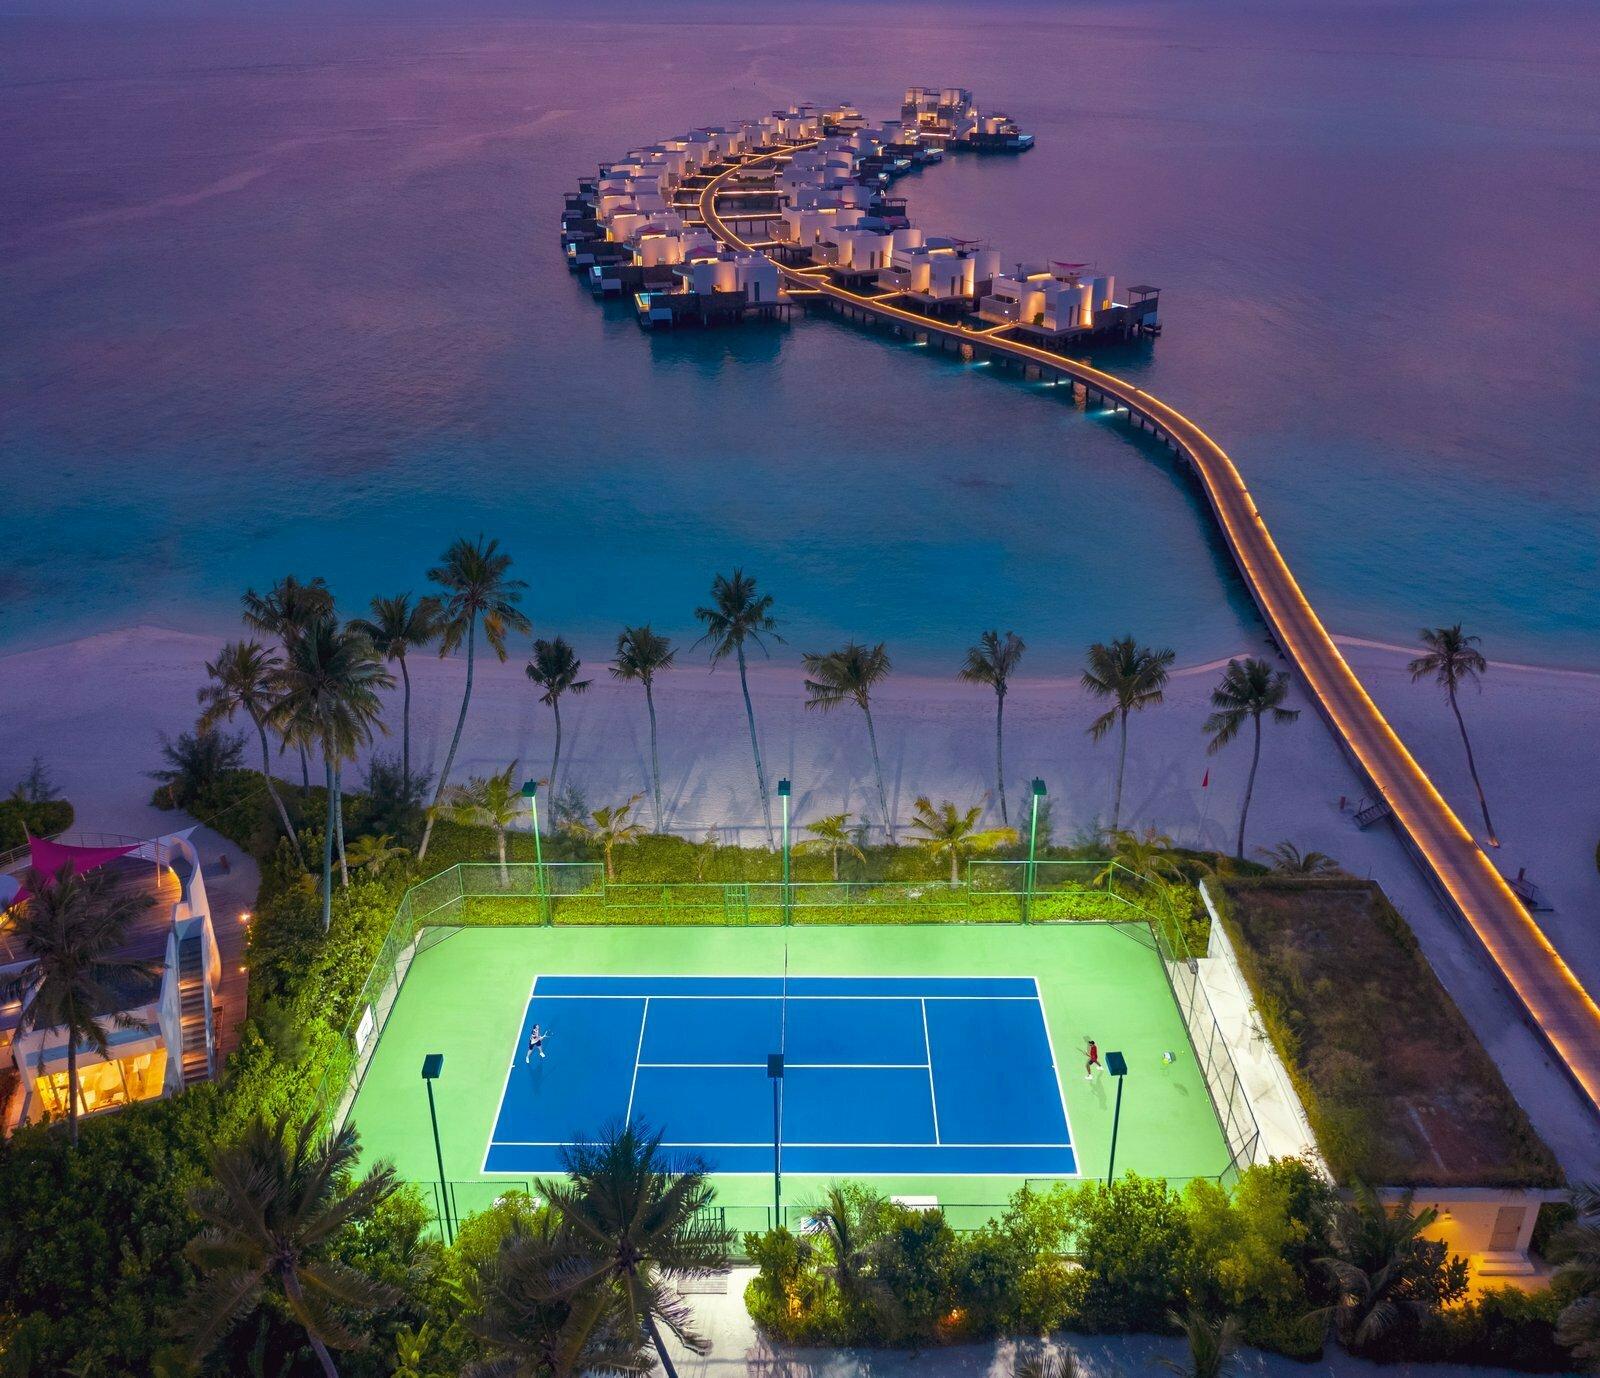 Мальдивы, отель LUX North Male Atoll, теннисный корт